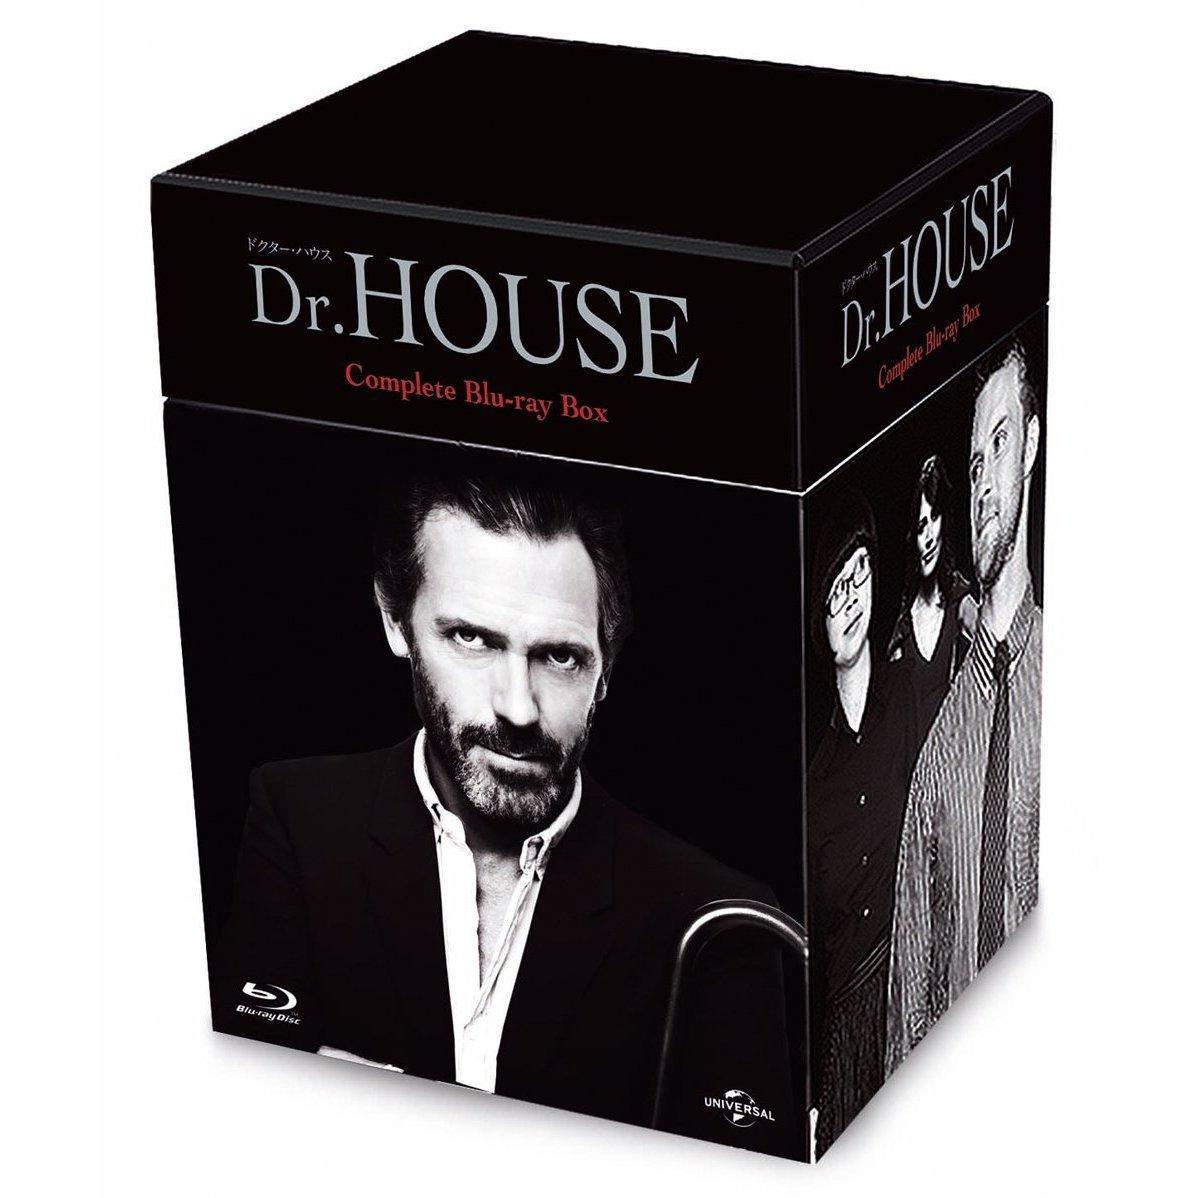 Dr.HOUSE/ドクター・ハウス コンプリート ブルーレイBOX【Blu-ray】 [ …...:book:16823854